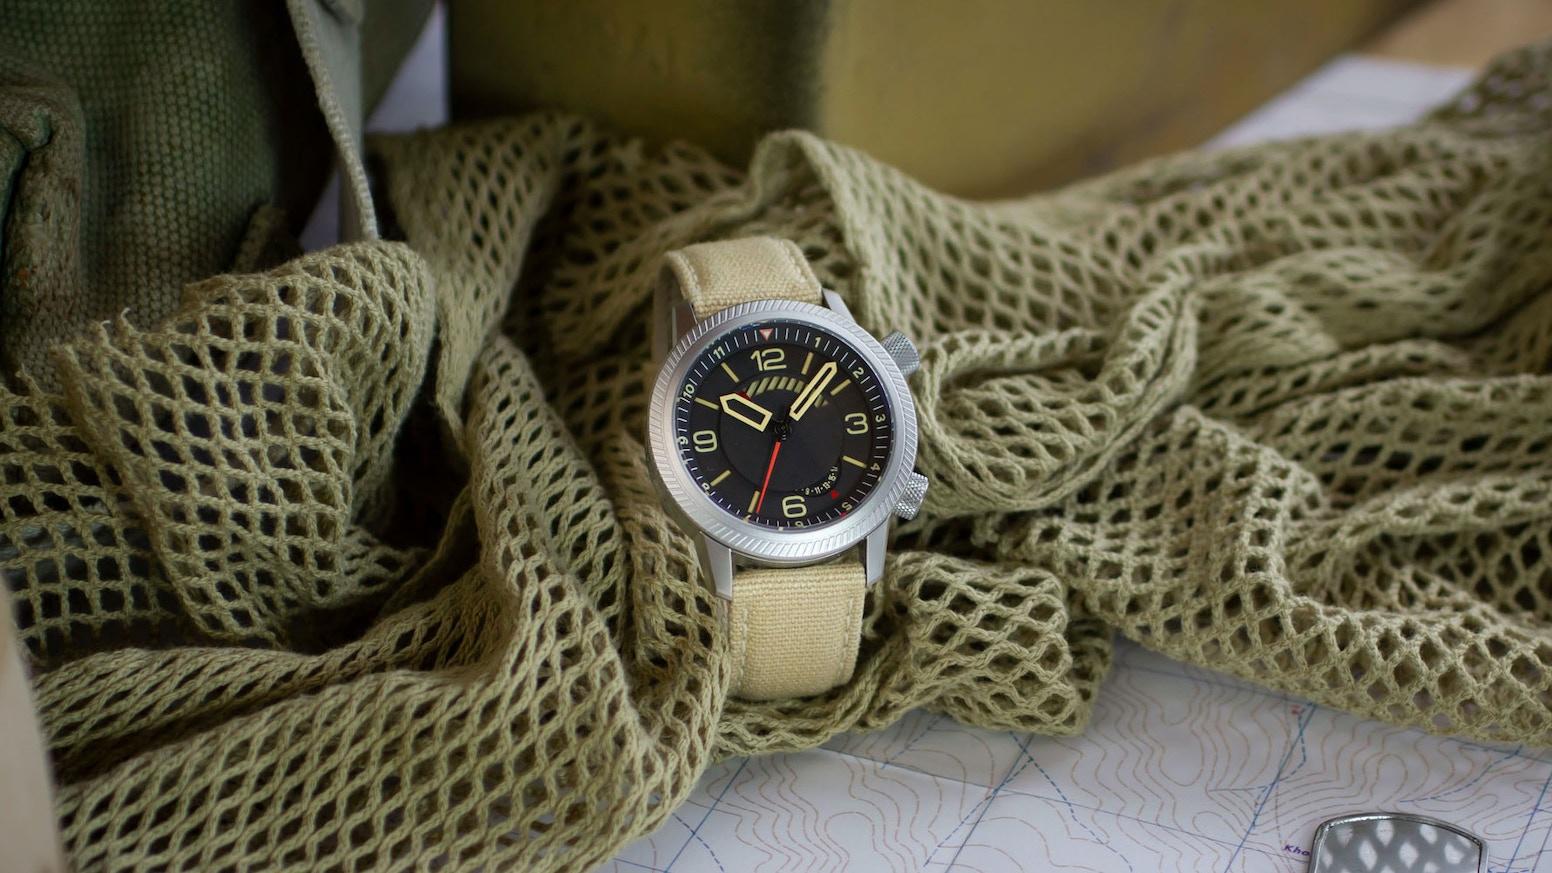 the draken kalahari automatic military watch by draken watches